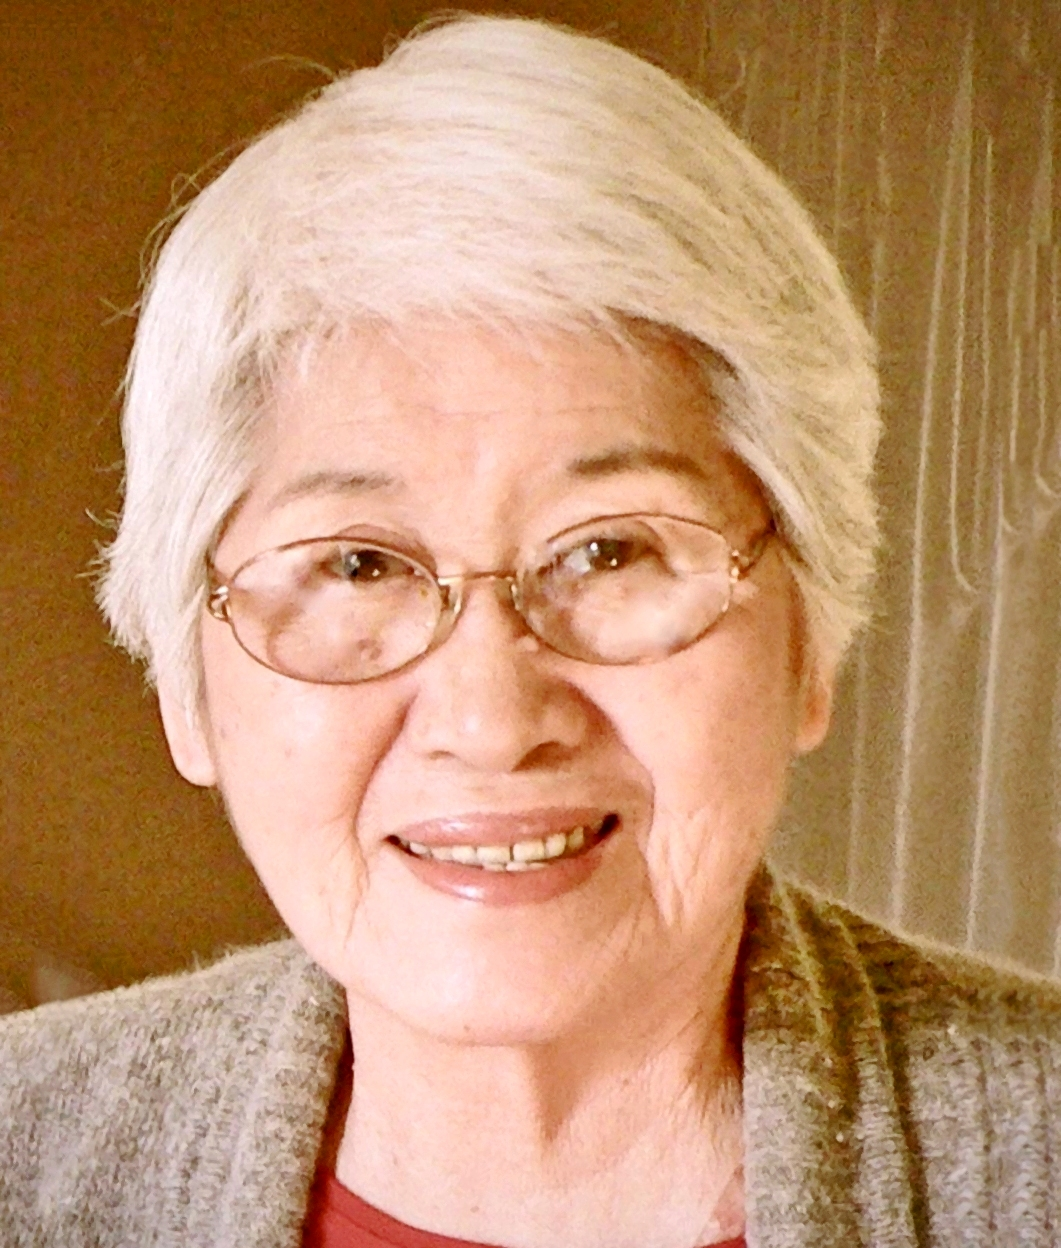 Angela Shizue Uehara